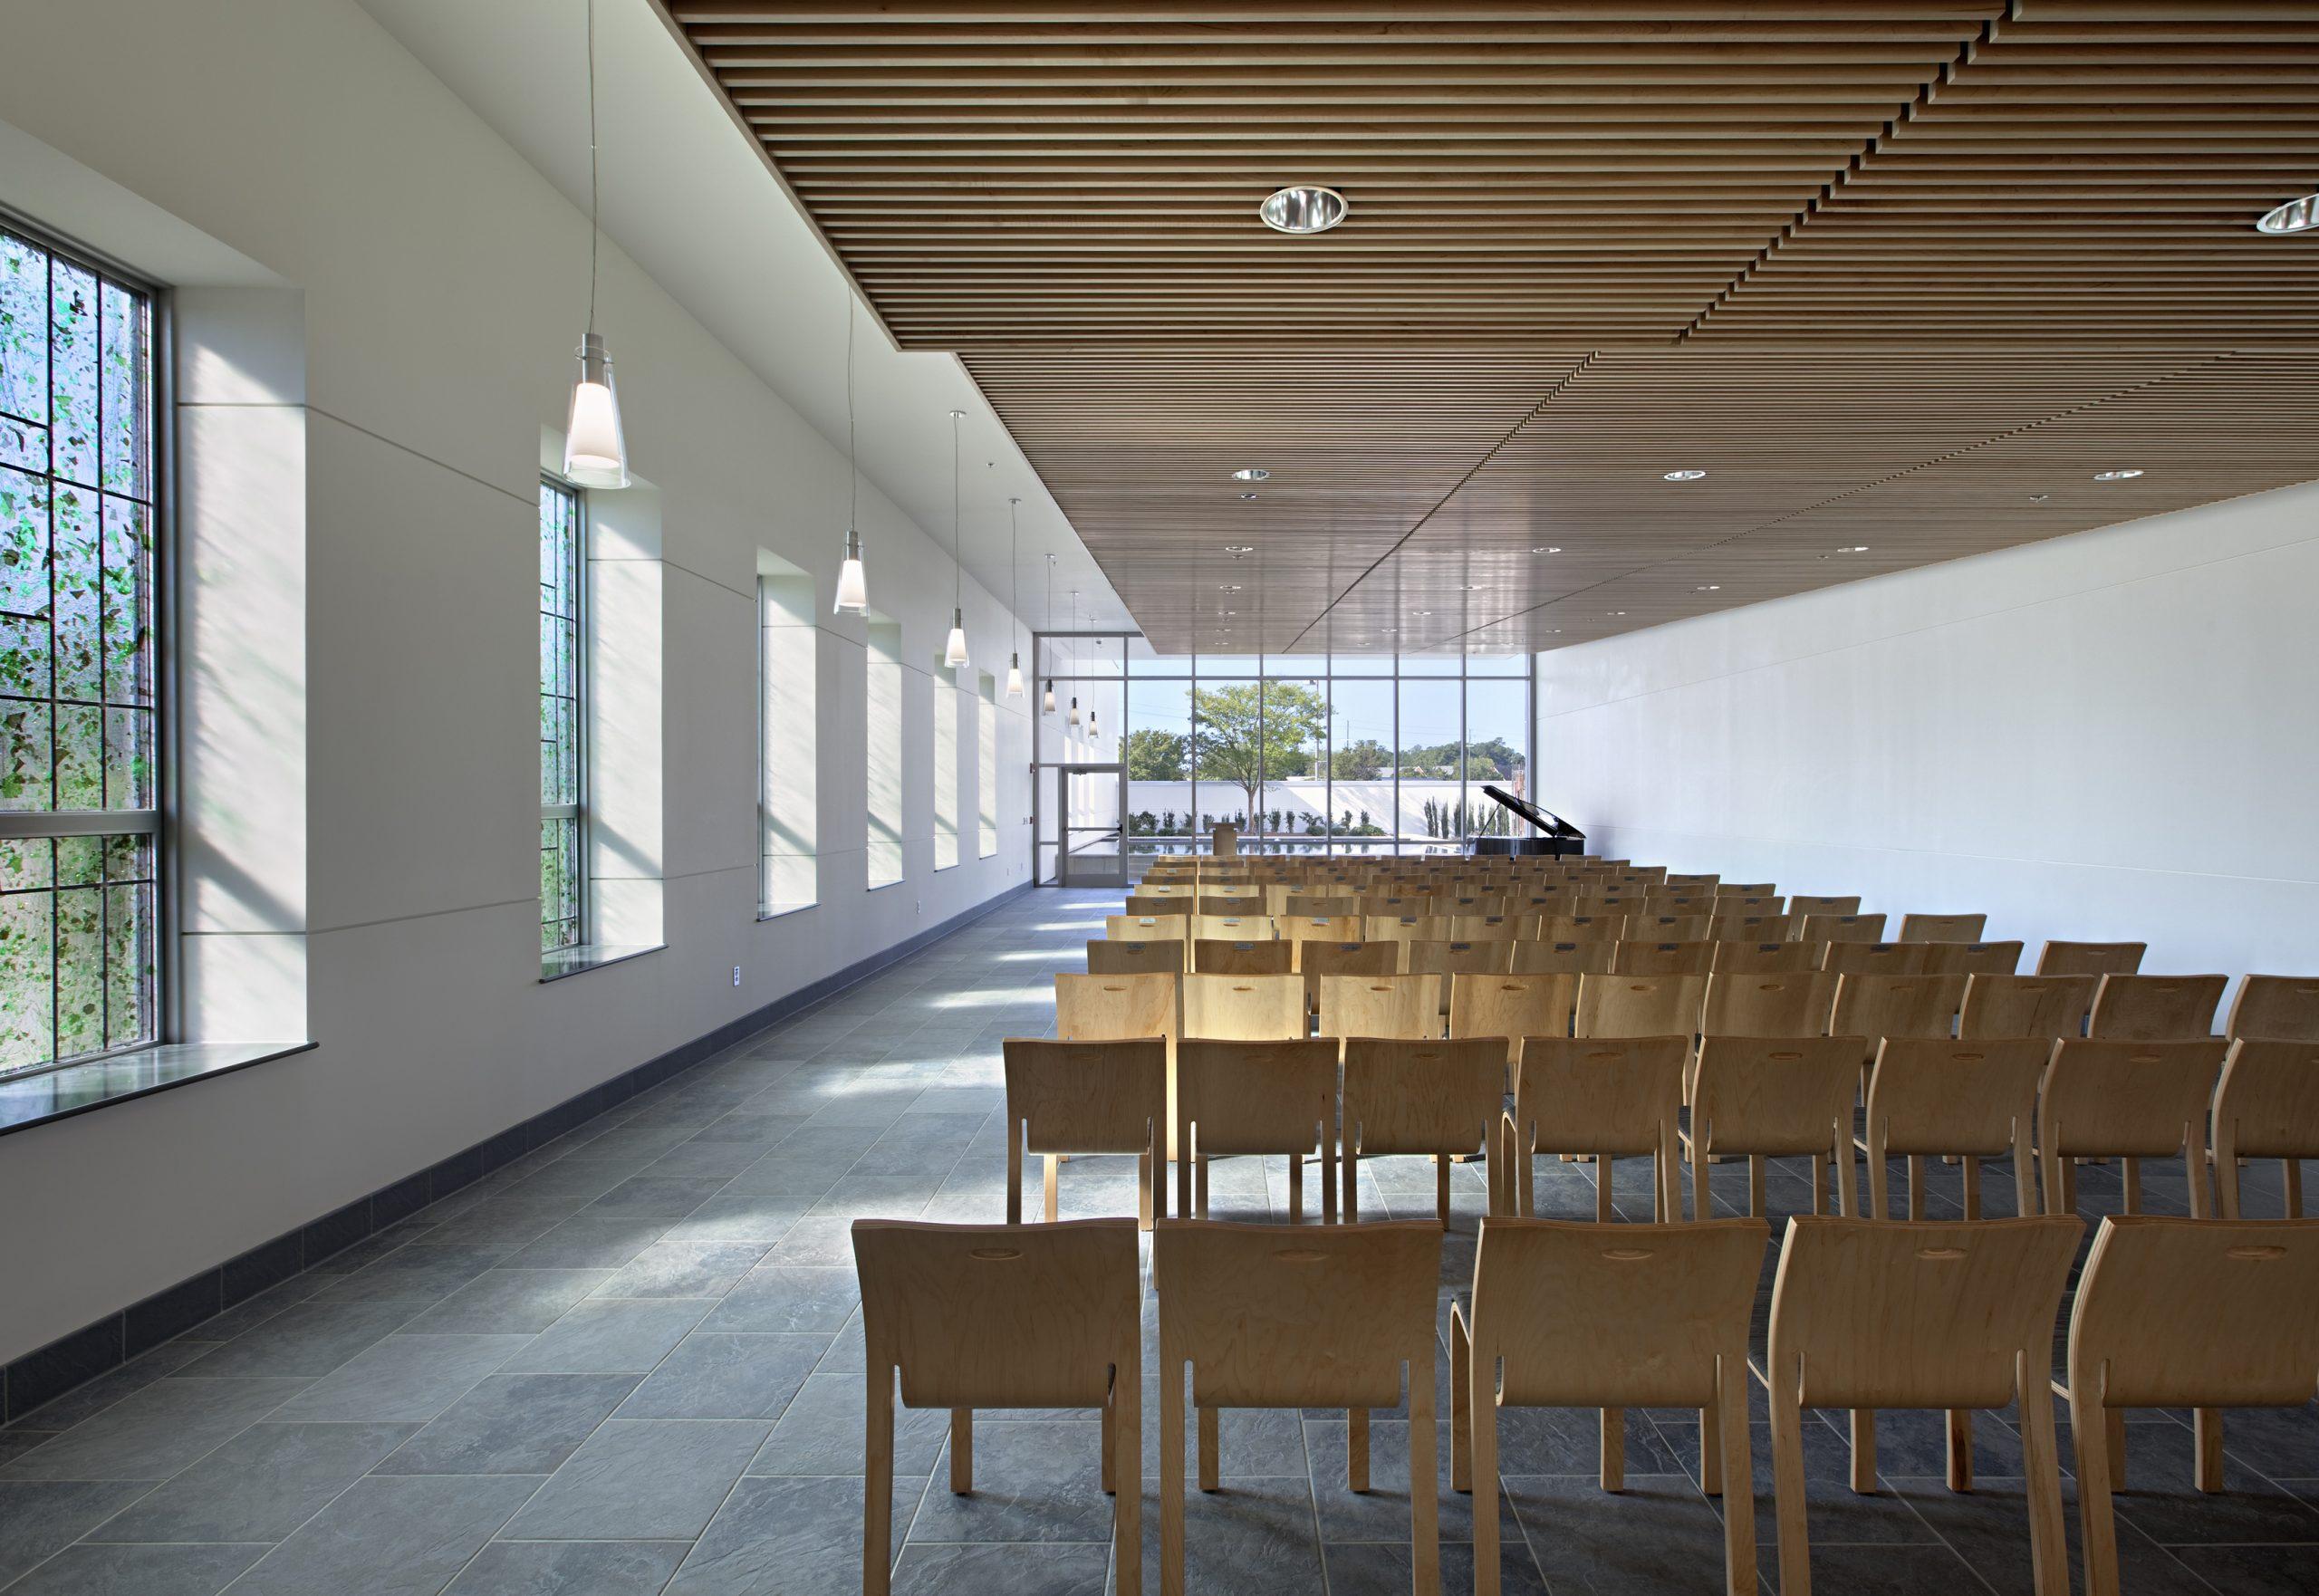 Pitt County Memorial Hospital Interfaith Chapel